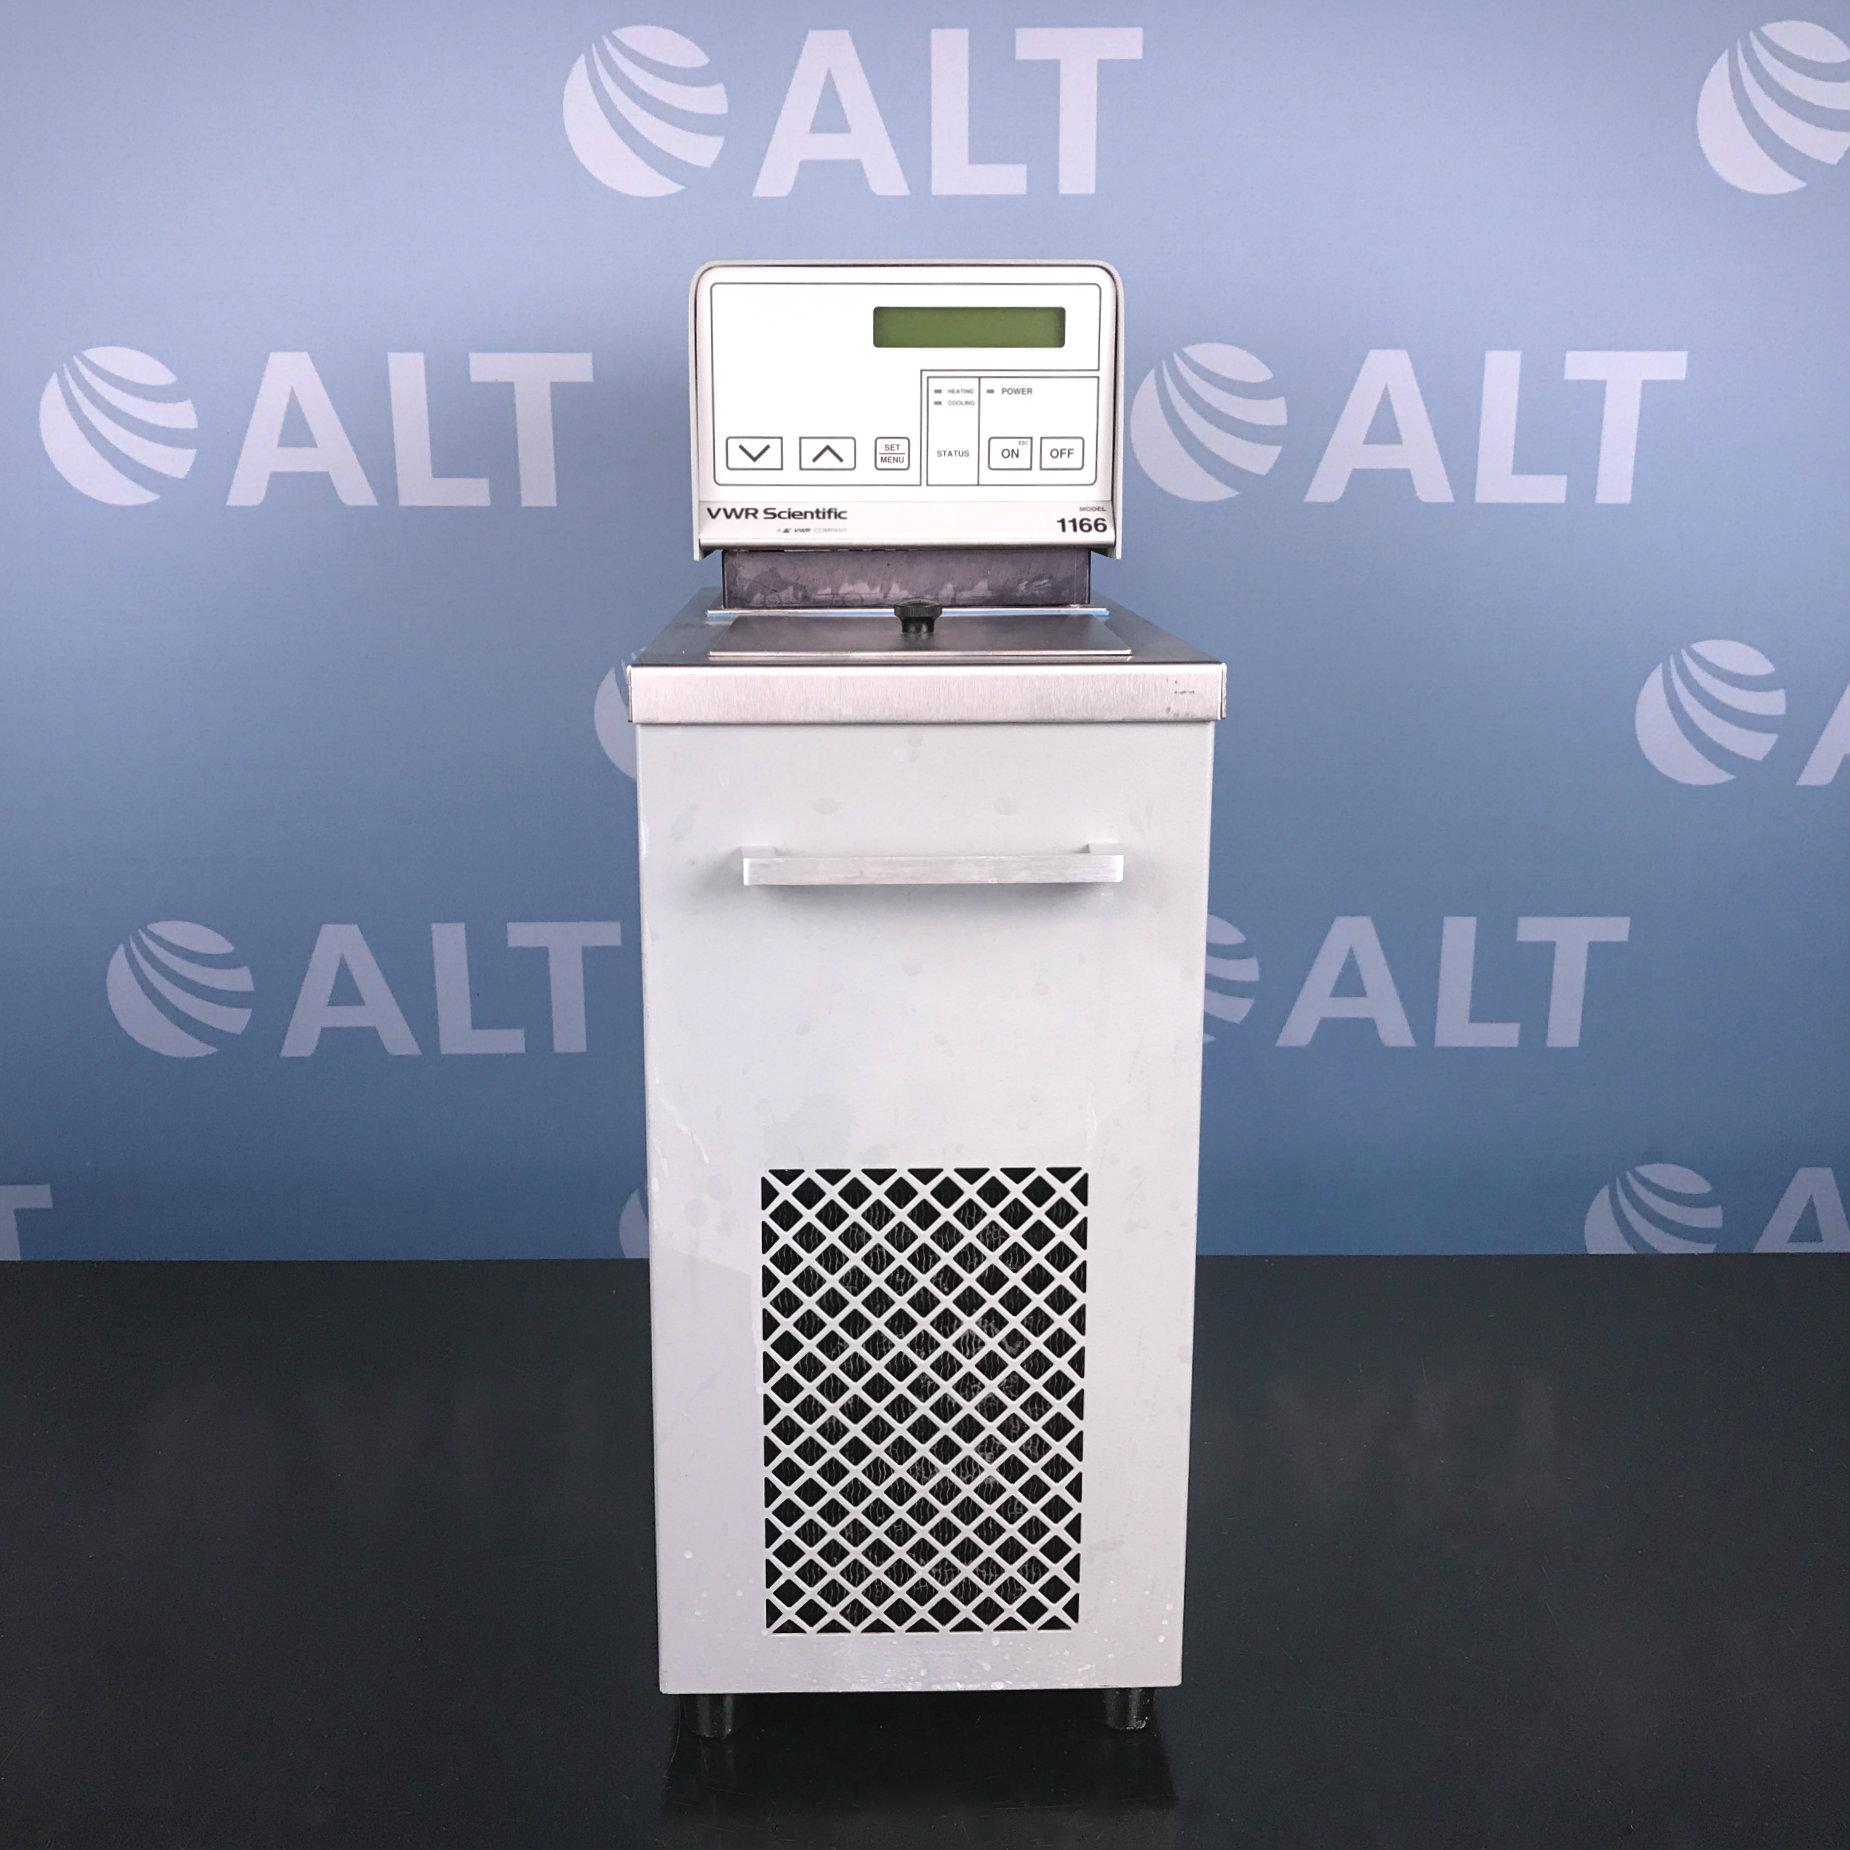 VWR 1166 Refrigerating Circulator Chiller Image